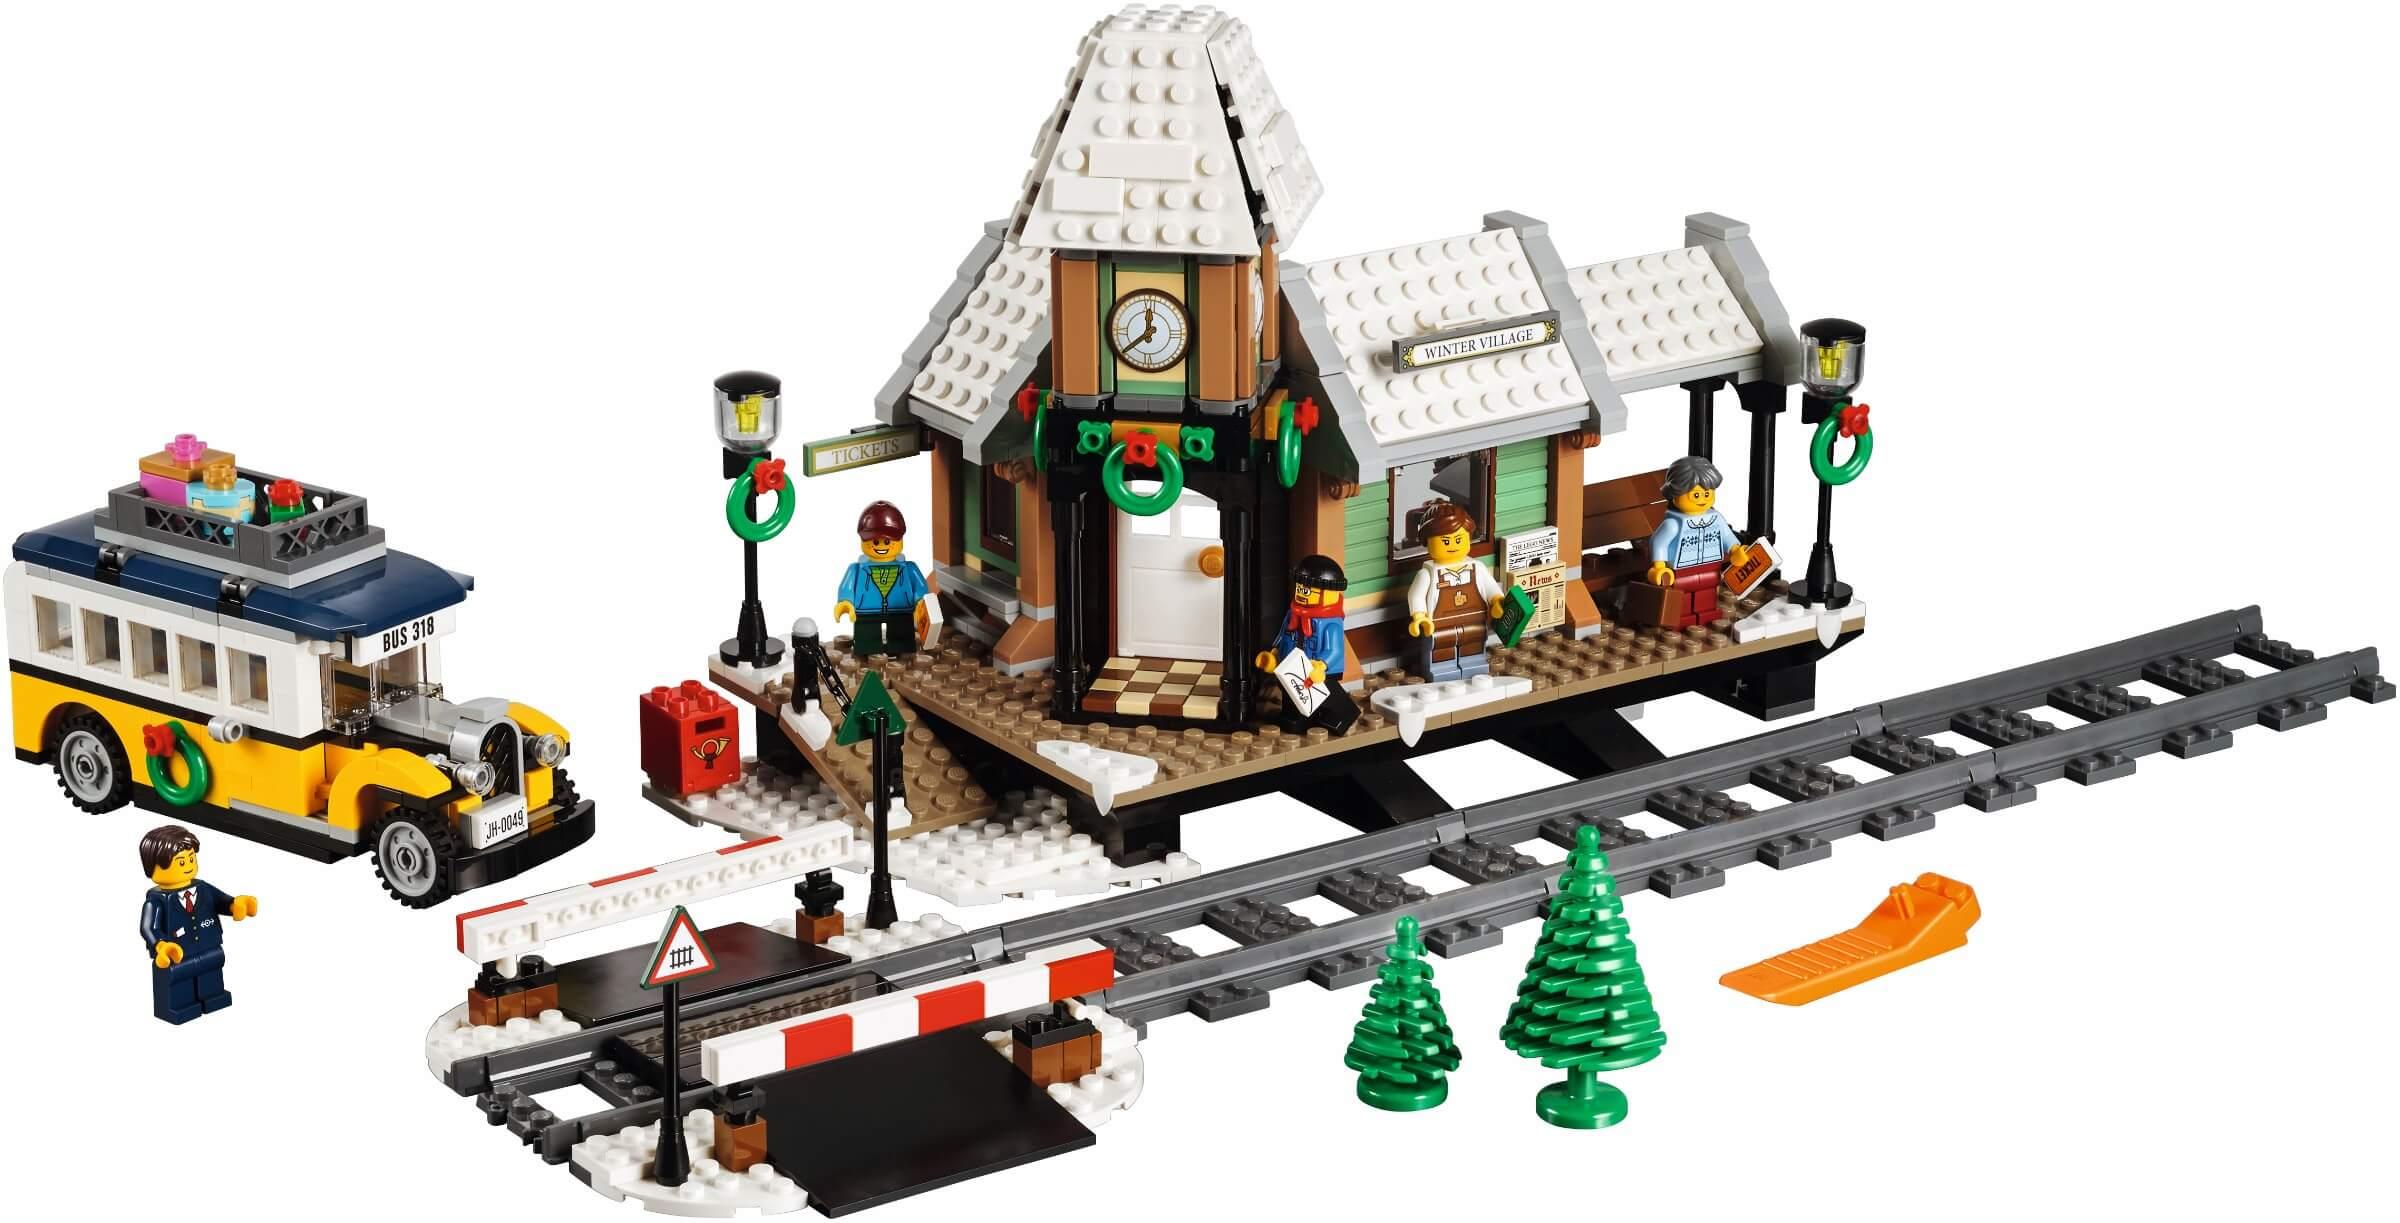 Mua đồ chơi LEGO 10259 - LEGO Creator Expert 10259 - Trạm Xe Lửa phủ Tuyết (LEGO 10259 Winter Village Station)